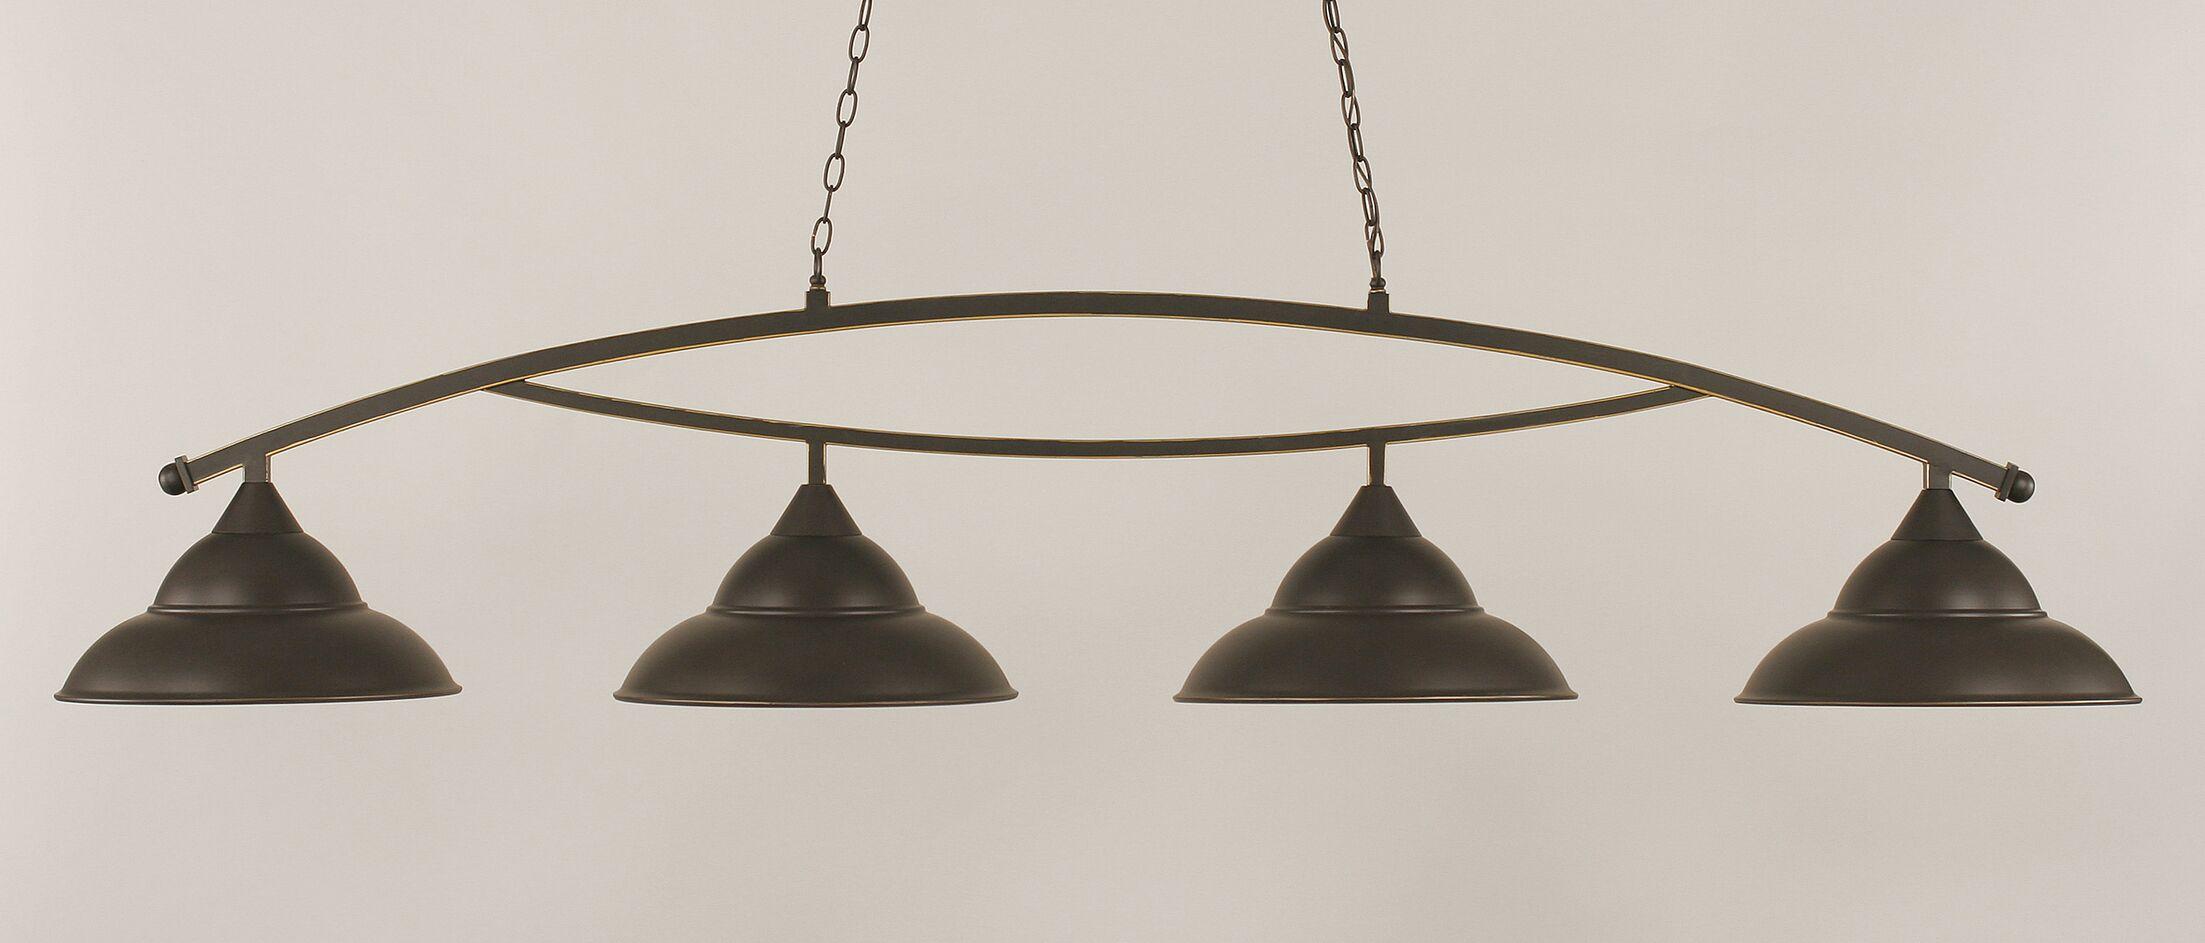 Eisenhauer 4-Light Billiard Light Finish: Dark Granite